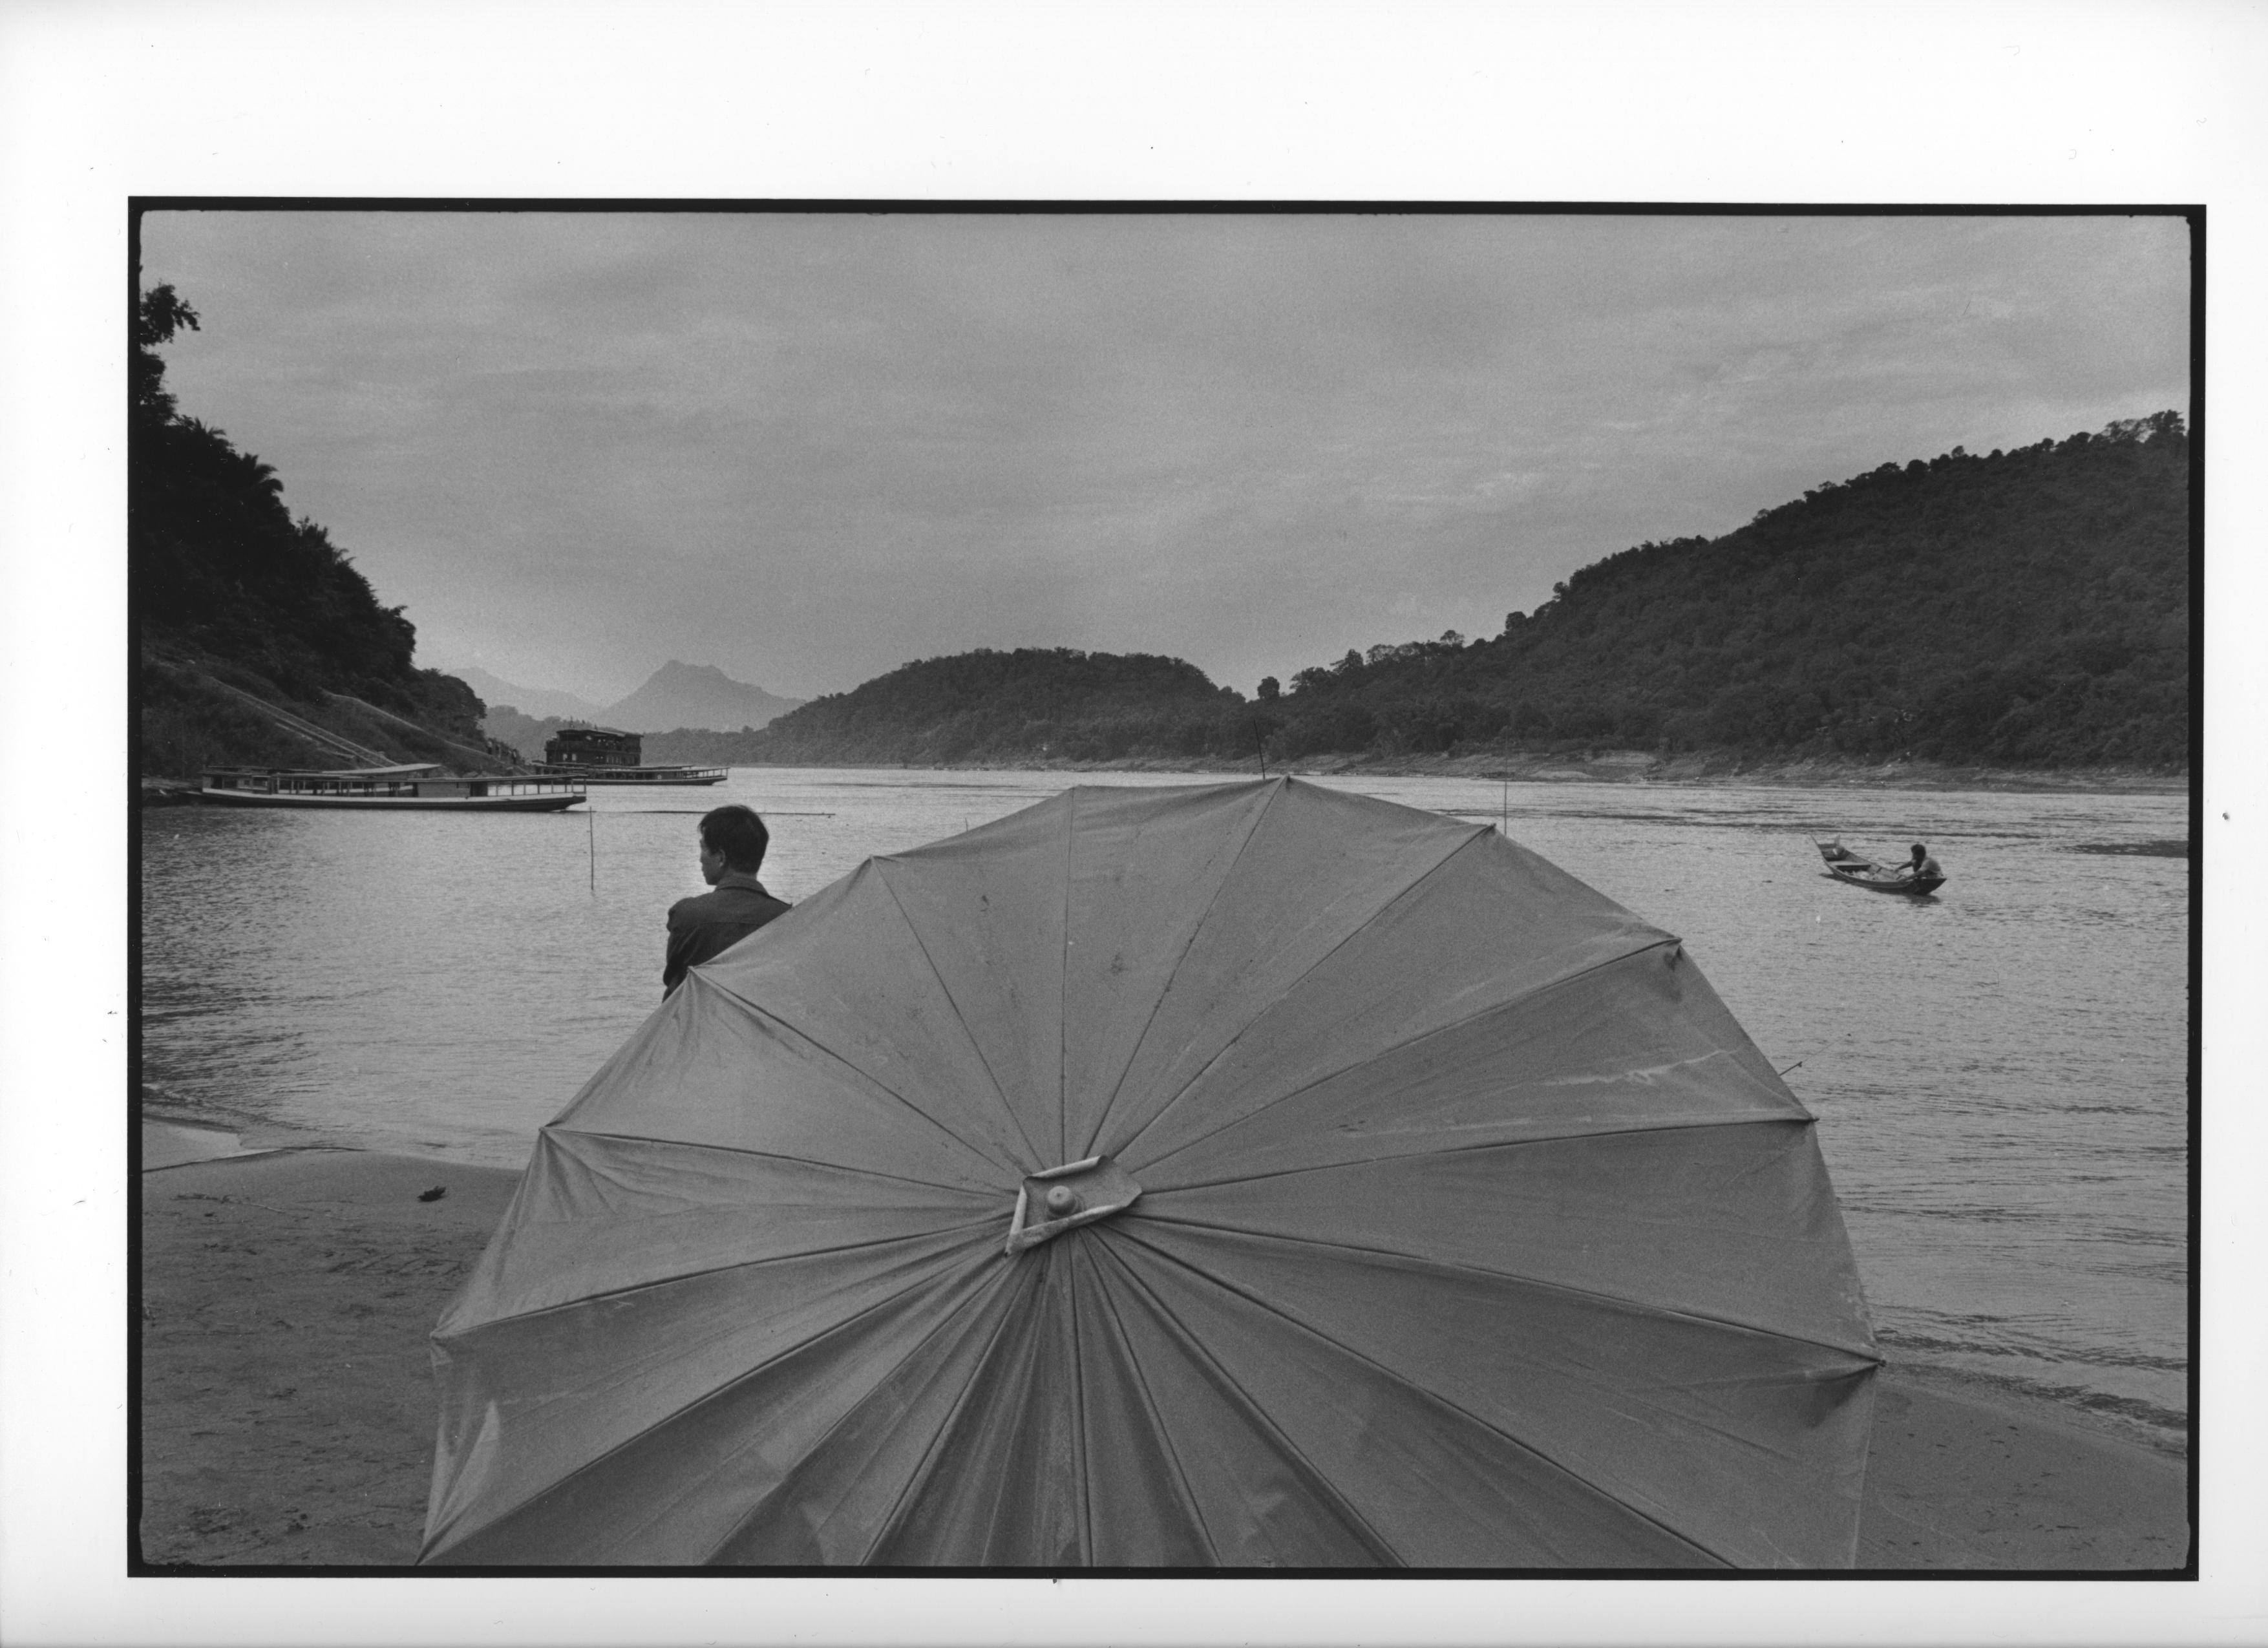 Mekong, Laos 2011, 70x100cm Gelatine Silver Print